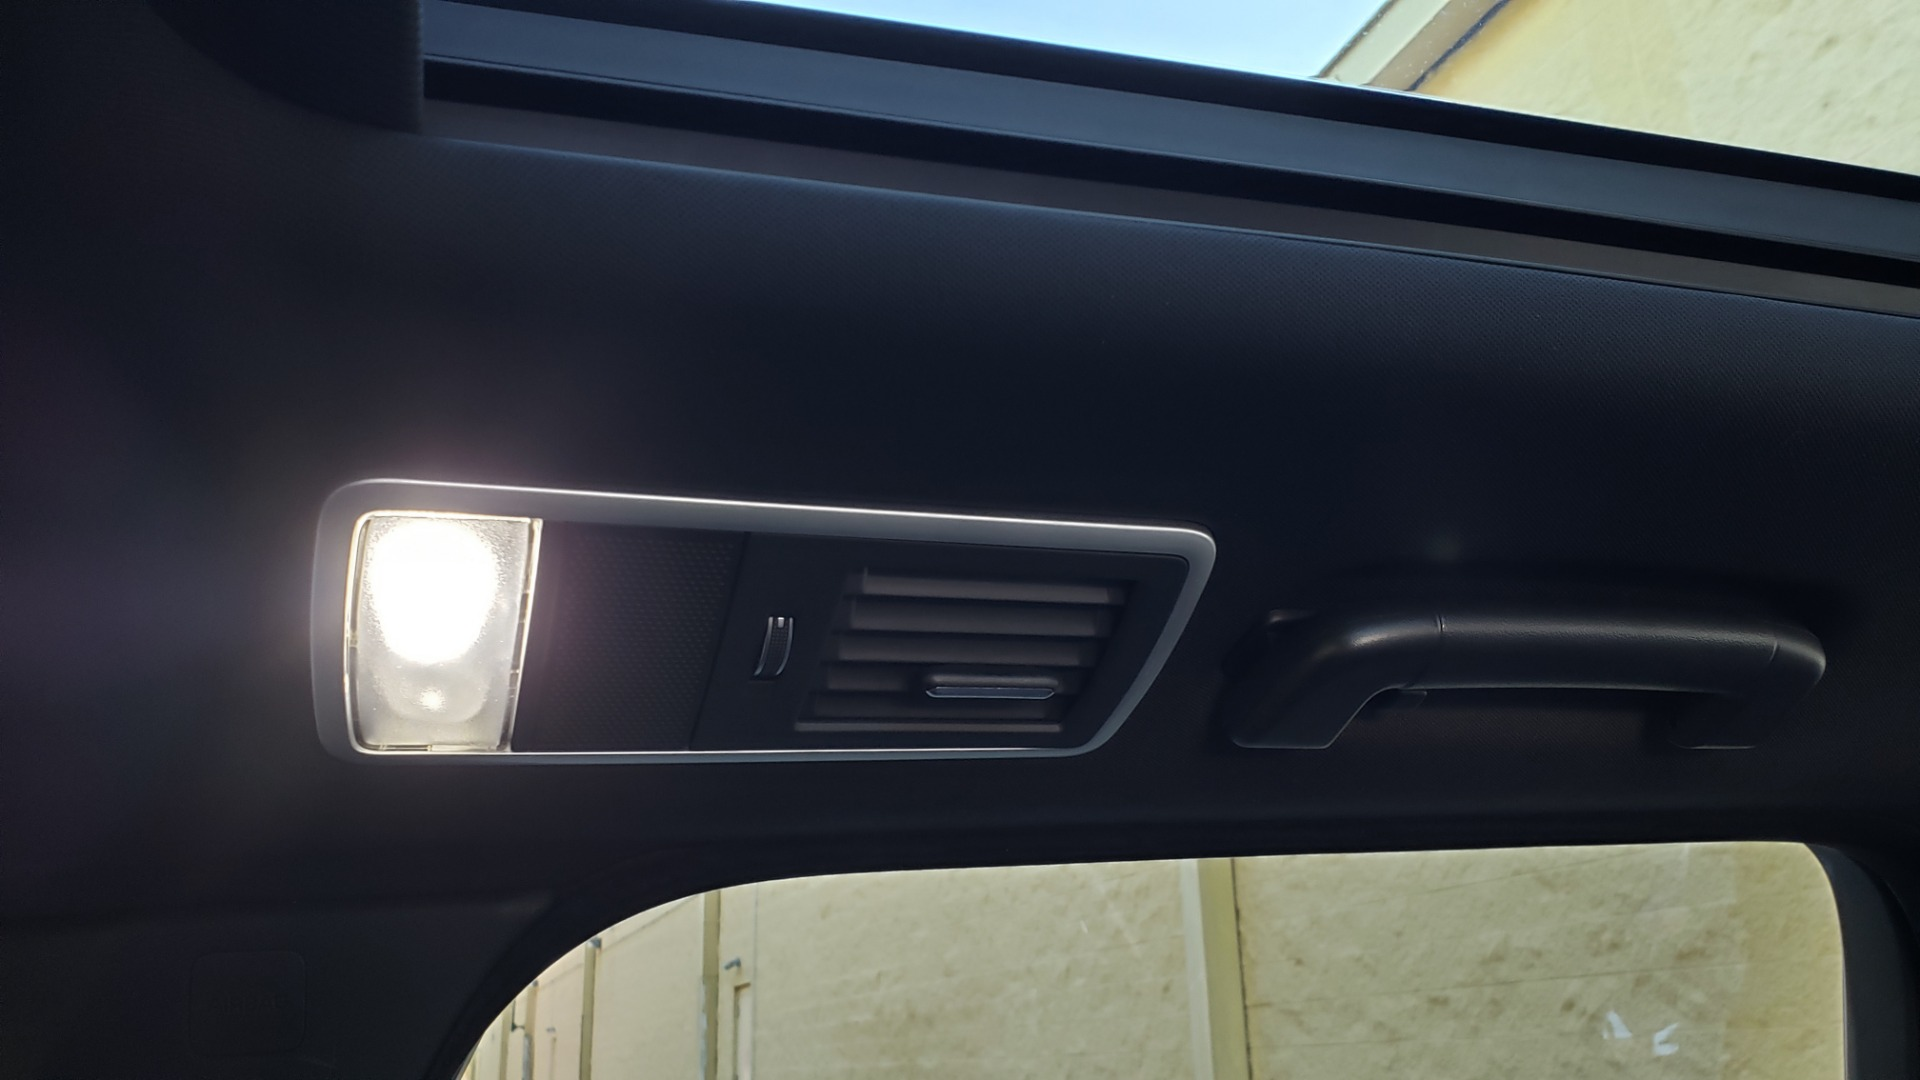 Used 2018 Land Rover RANGE ROVER SPORT DYNAMIC SC V8 / CLIMATE CMFRT / VISION ASST / MERIDIAN for sale Sold at Formula Imports in Charlotte NC 28227 91